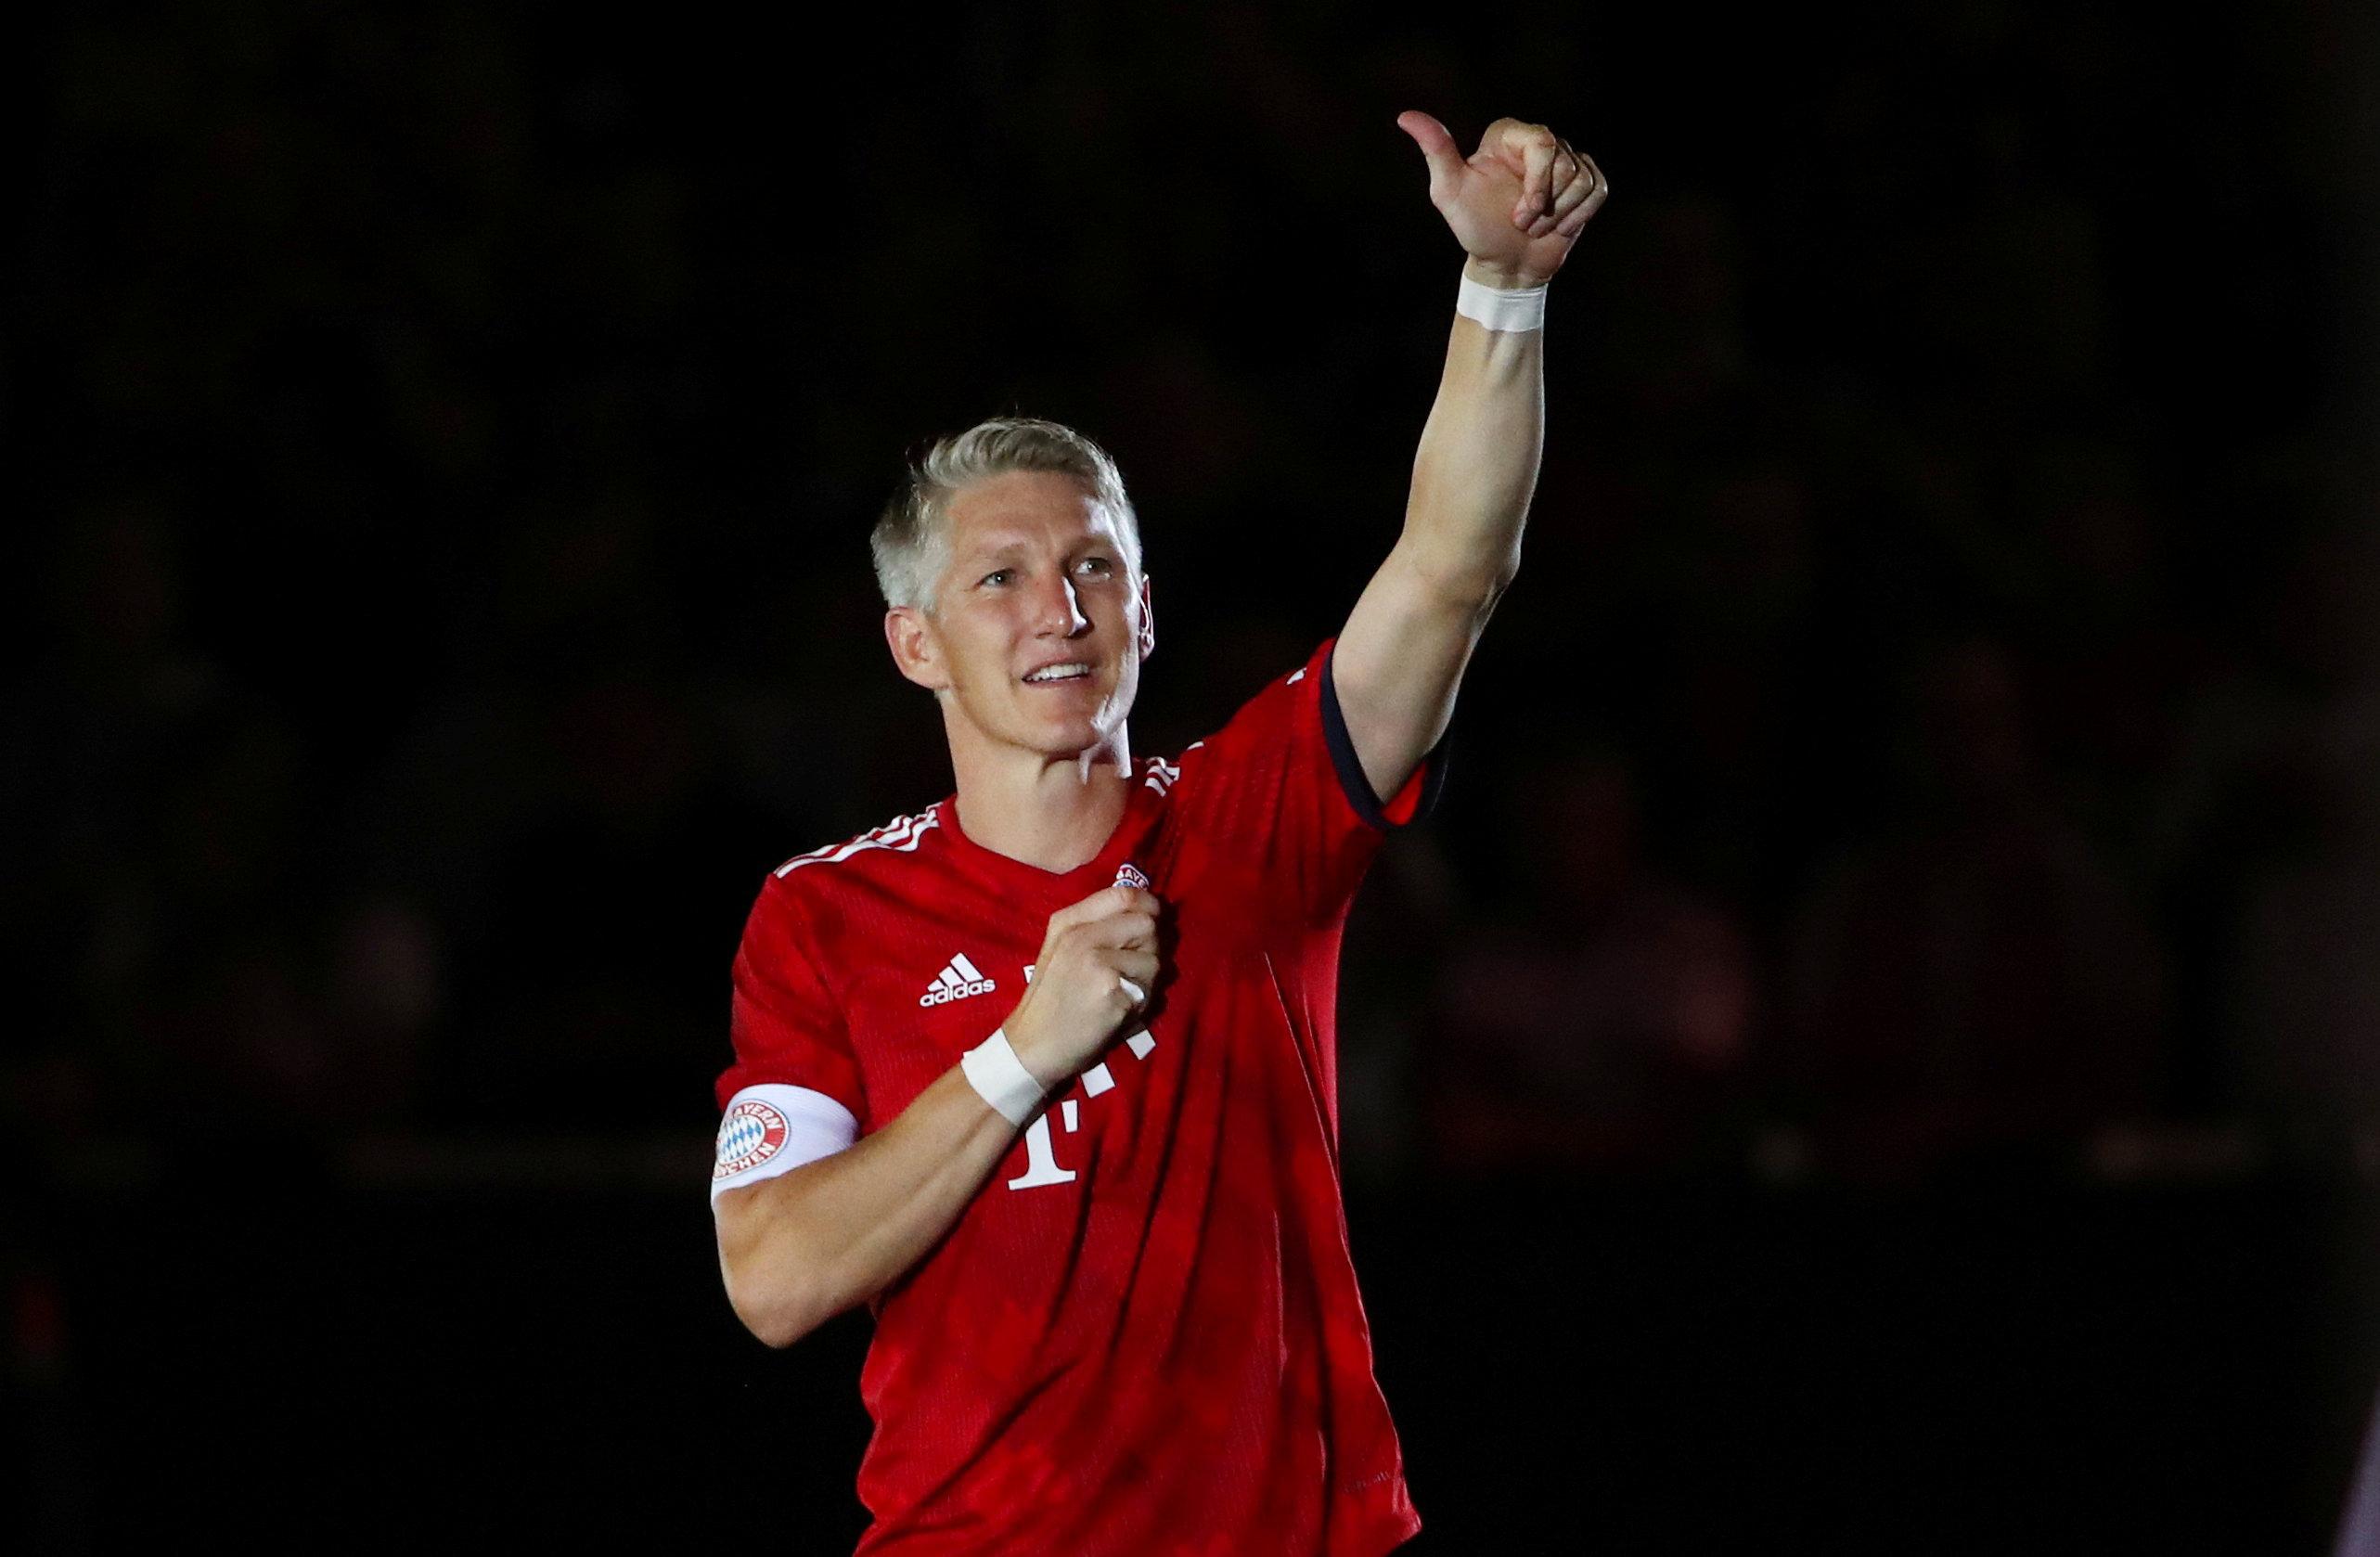 Former Bayern Munich & Manchester United star Bastian Schweinsteiger announces retirement